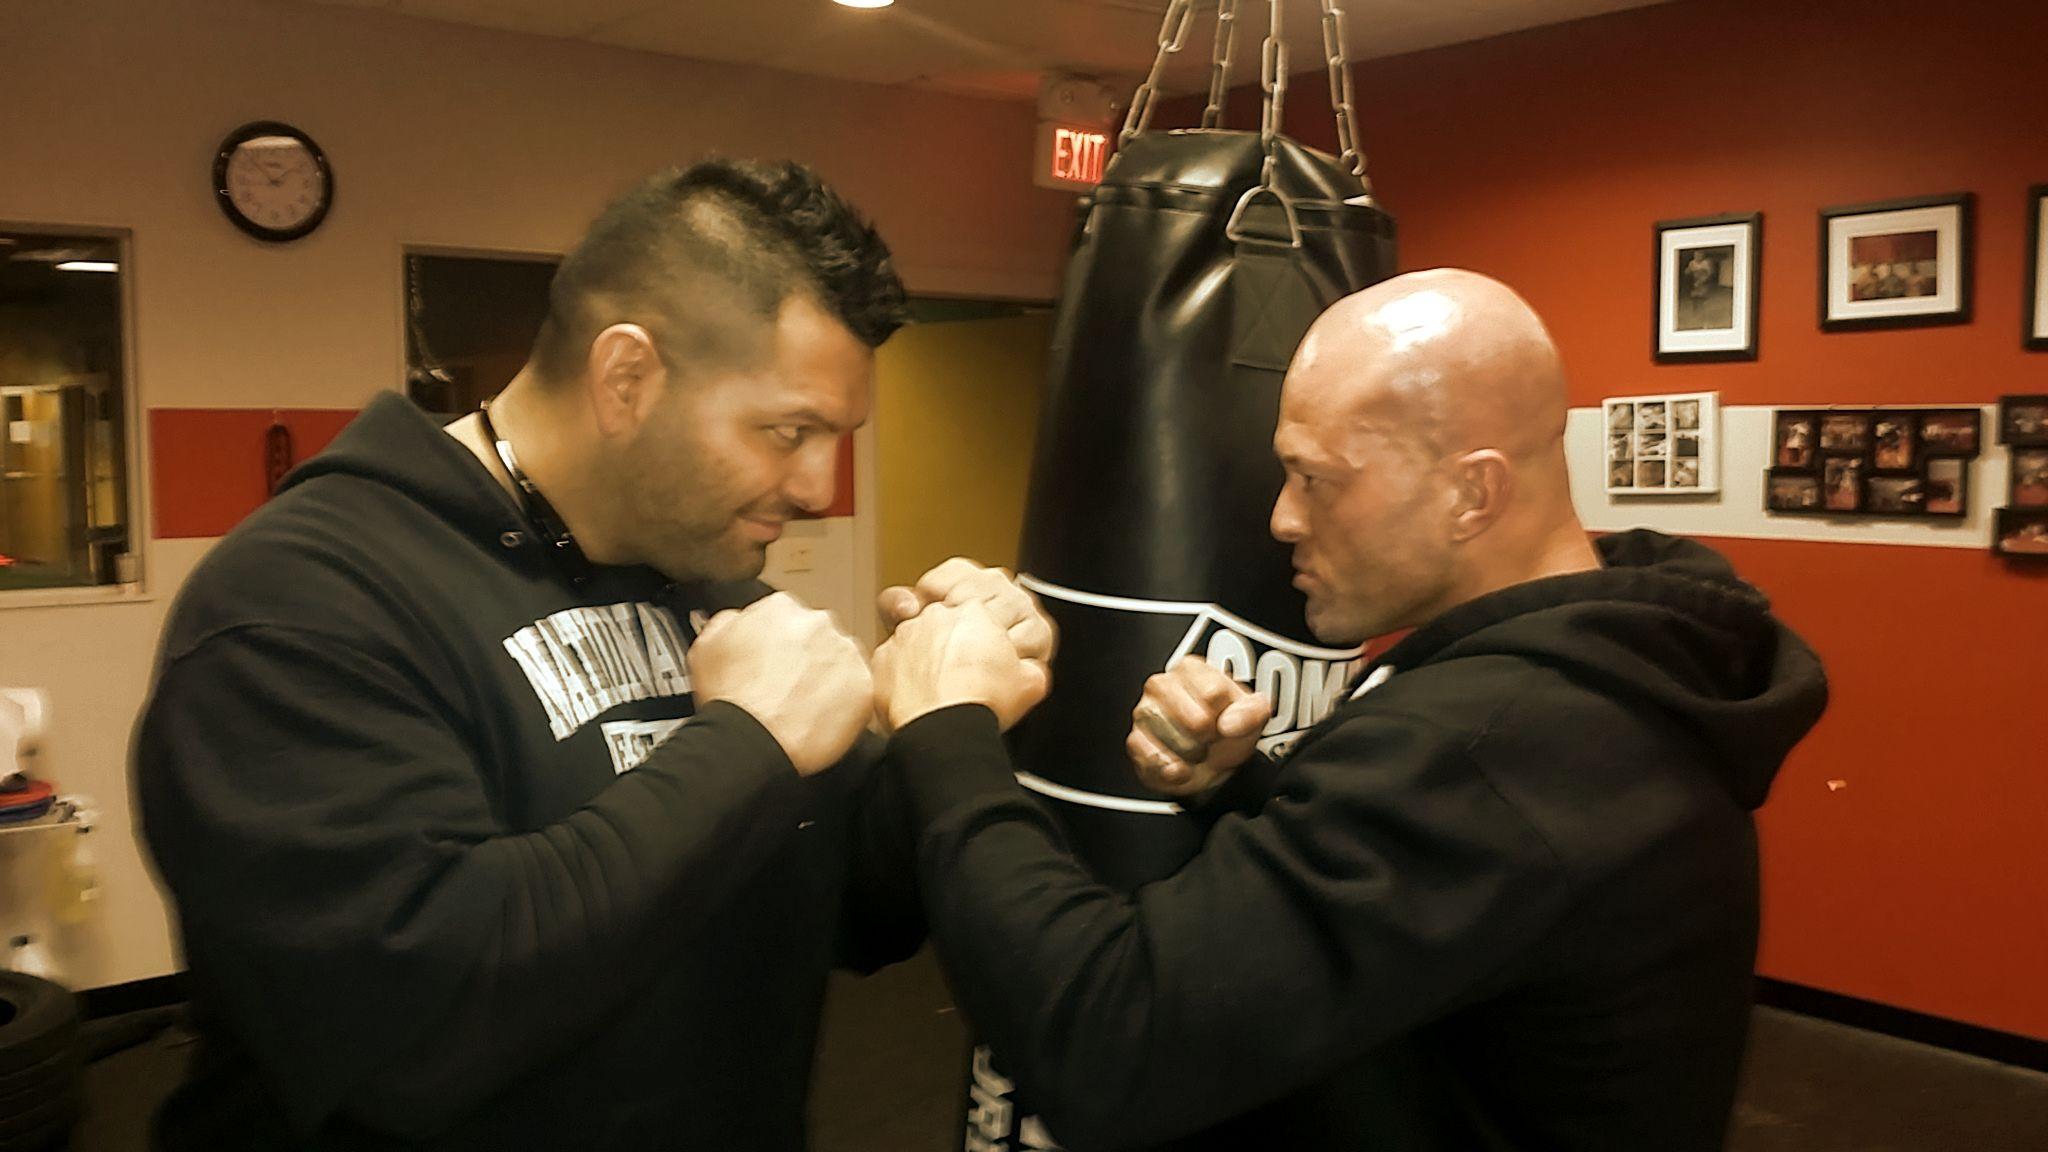 Performance Boxing Trainer John Espada & John Joseph Quinlan of Greater Boston Fitness Gym #JohnQuinlan